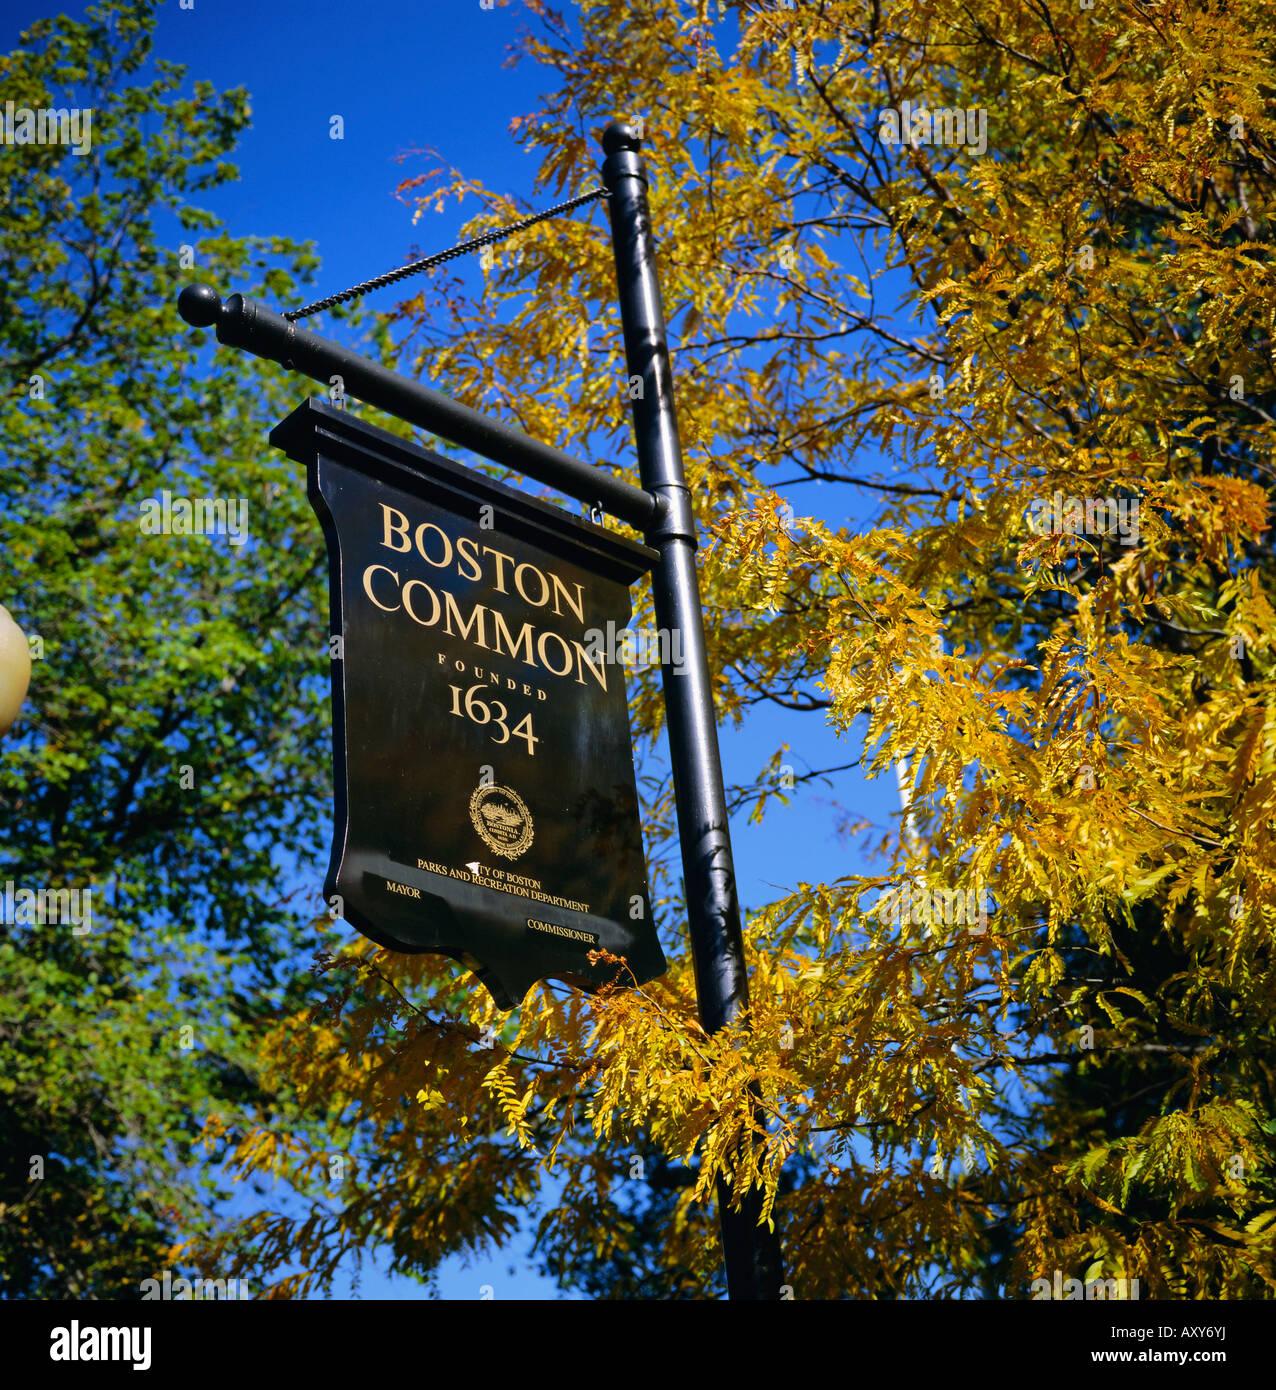 Signo común de Boston, Boston Common, Massachussets, Nueva Inglaterra, Estados Unidos, América del Norte Imagen De Stock